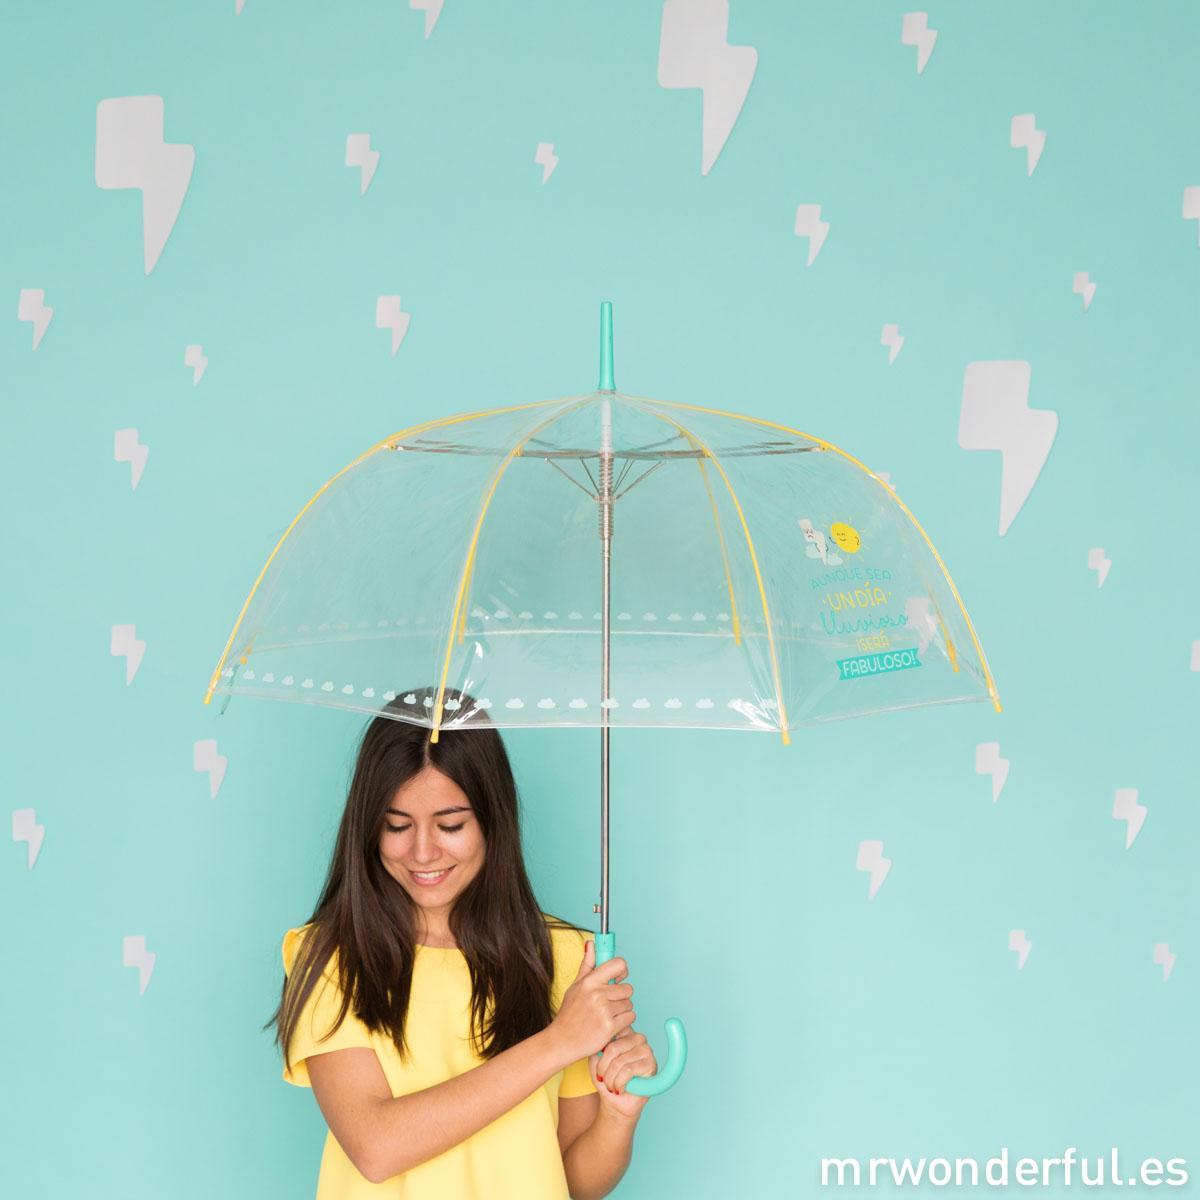 mrwonderful_8435460702935_WOA03185_paraguas_aunque-sea-un-dia-lluvioso_L_CAST-27-Editar-2